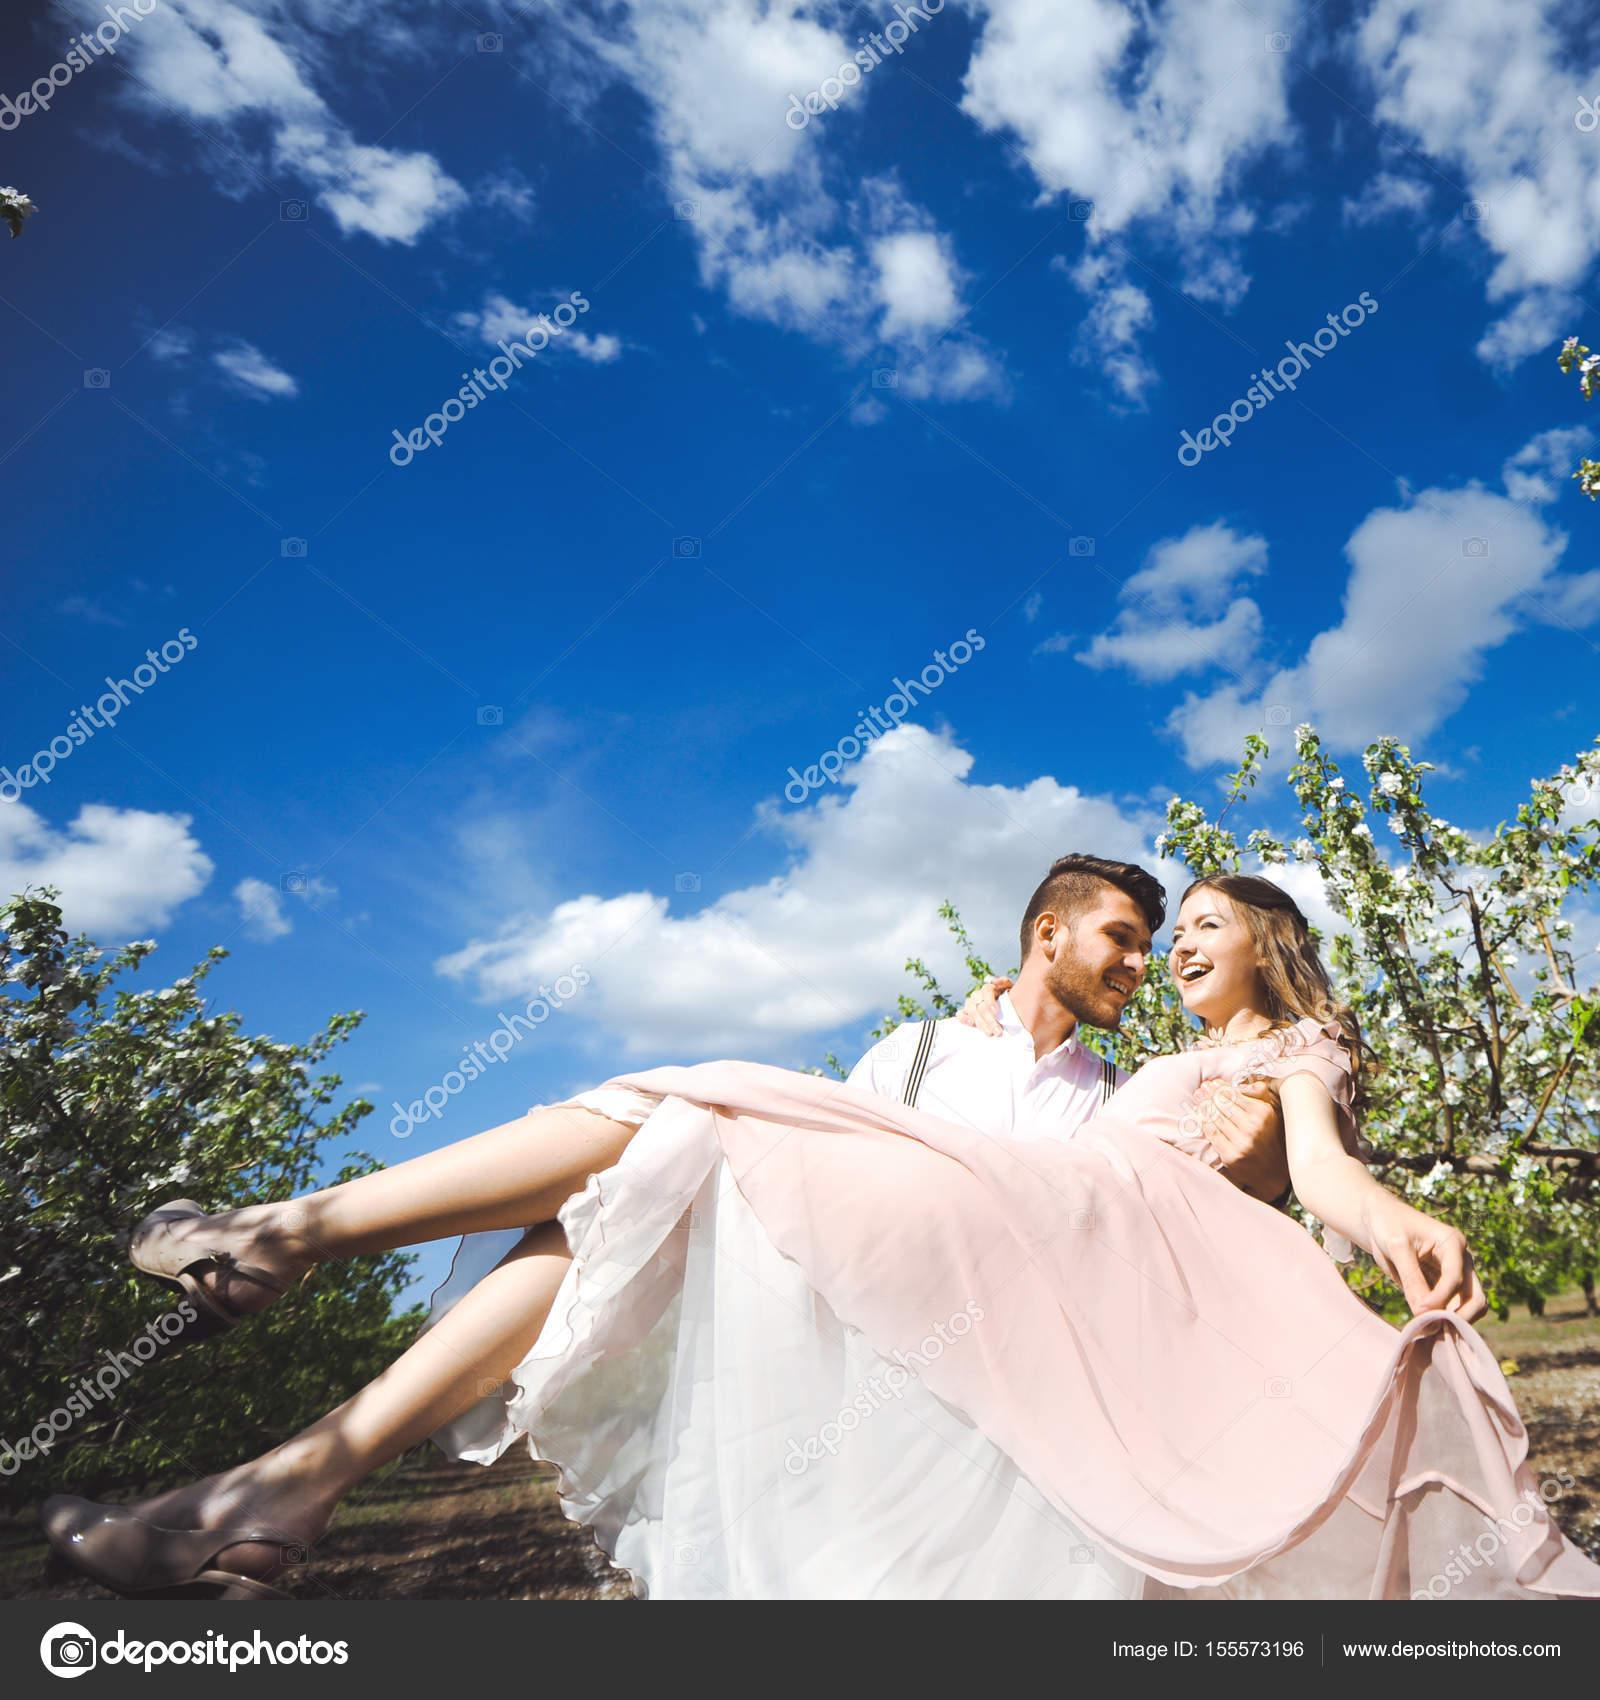 796918710a02 φόρεμα ζευγάρι του ένα κορίτσι και τύπος ψάχνει για ένα γάμο